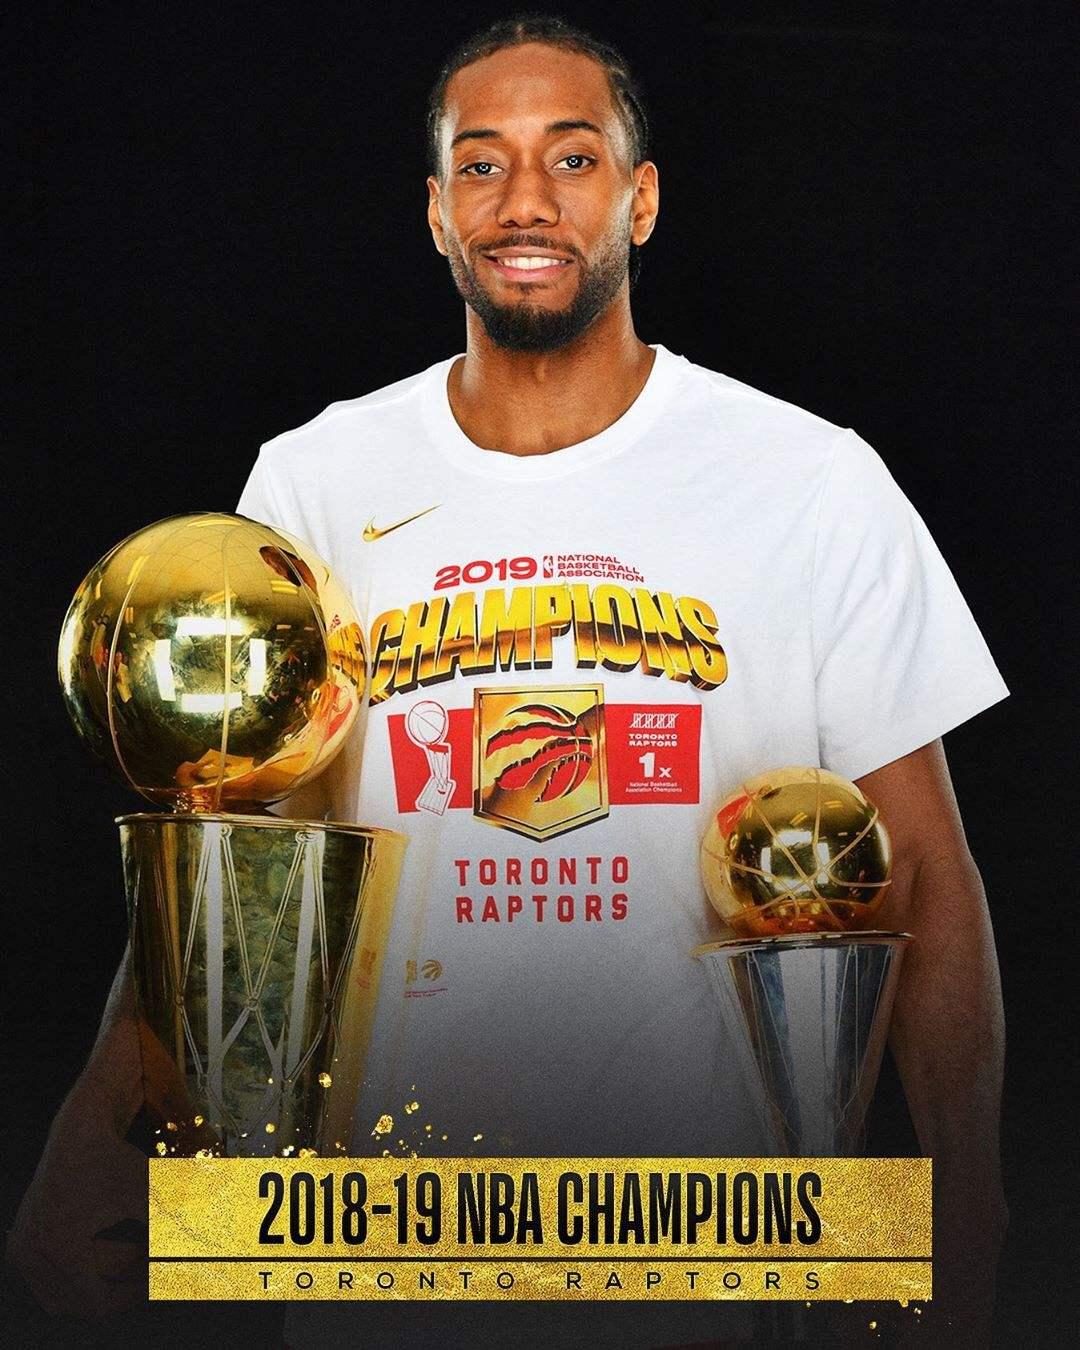 NBA歷史上對頂級超巨的定義是什么?庫里、小卡都不夠格 ?